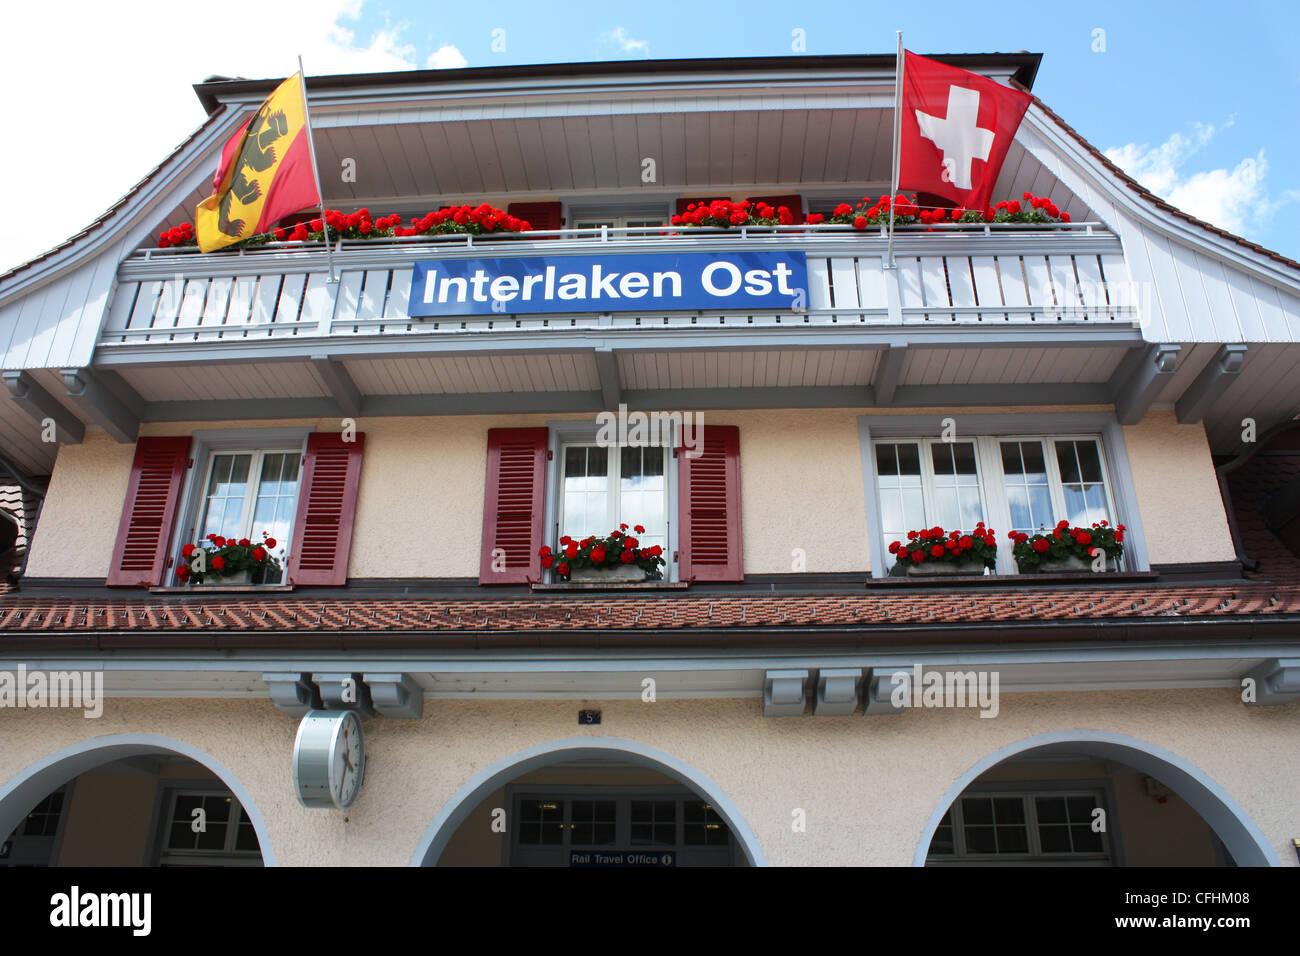 Interlaken Ost train station ticket office in Switzerland - Stock Image